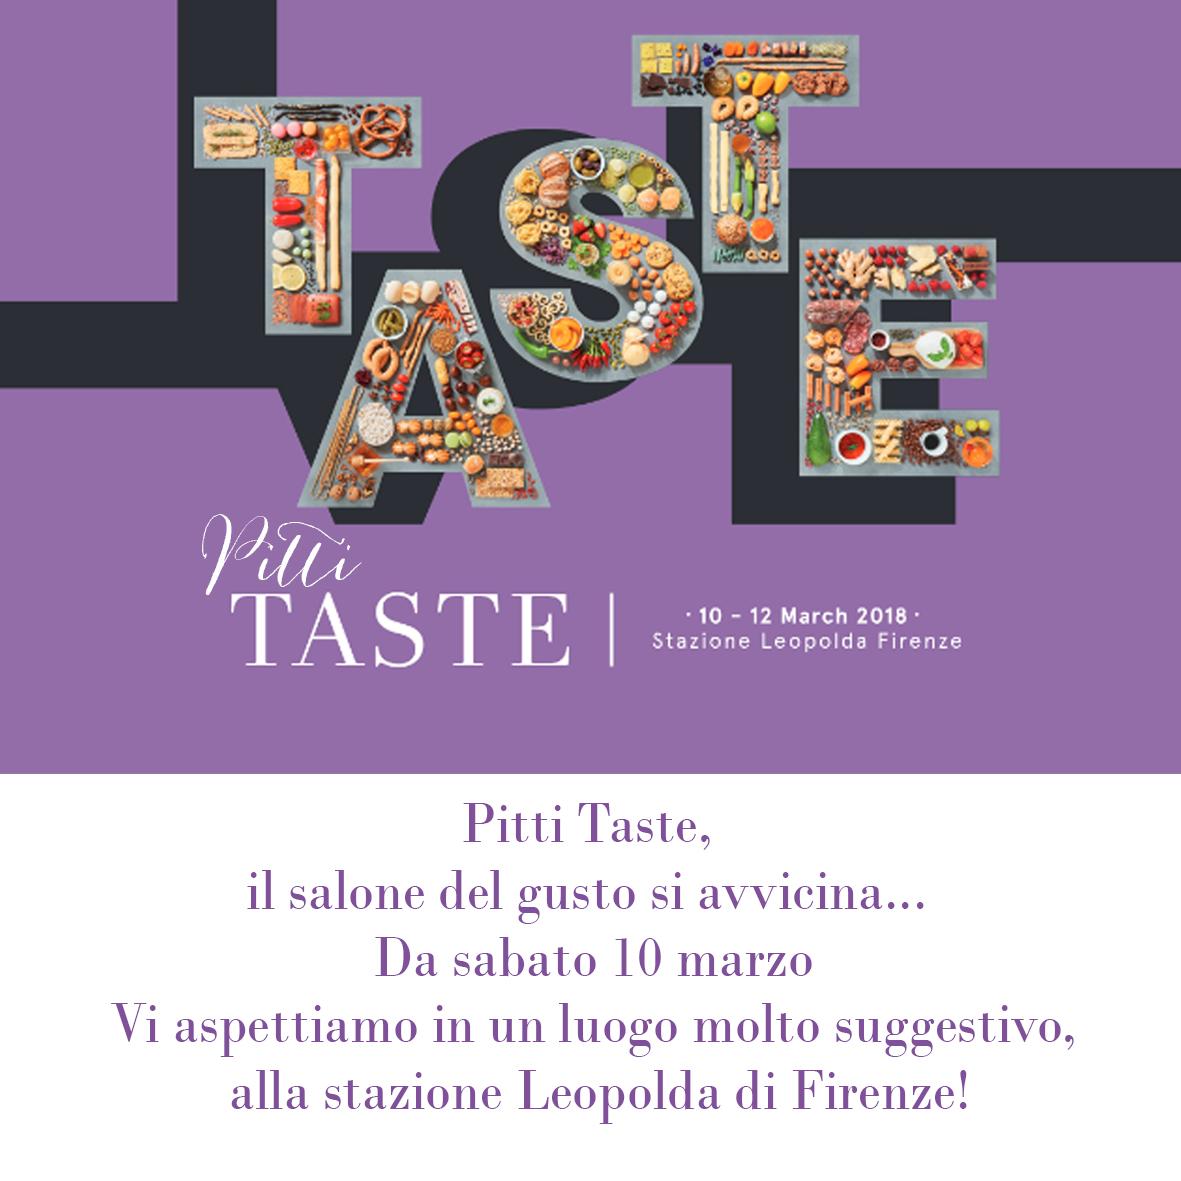 pitti taste 2018